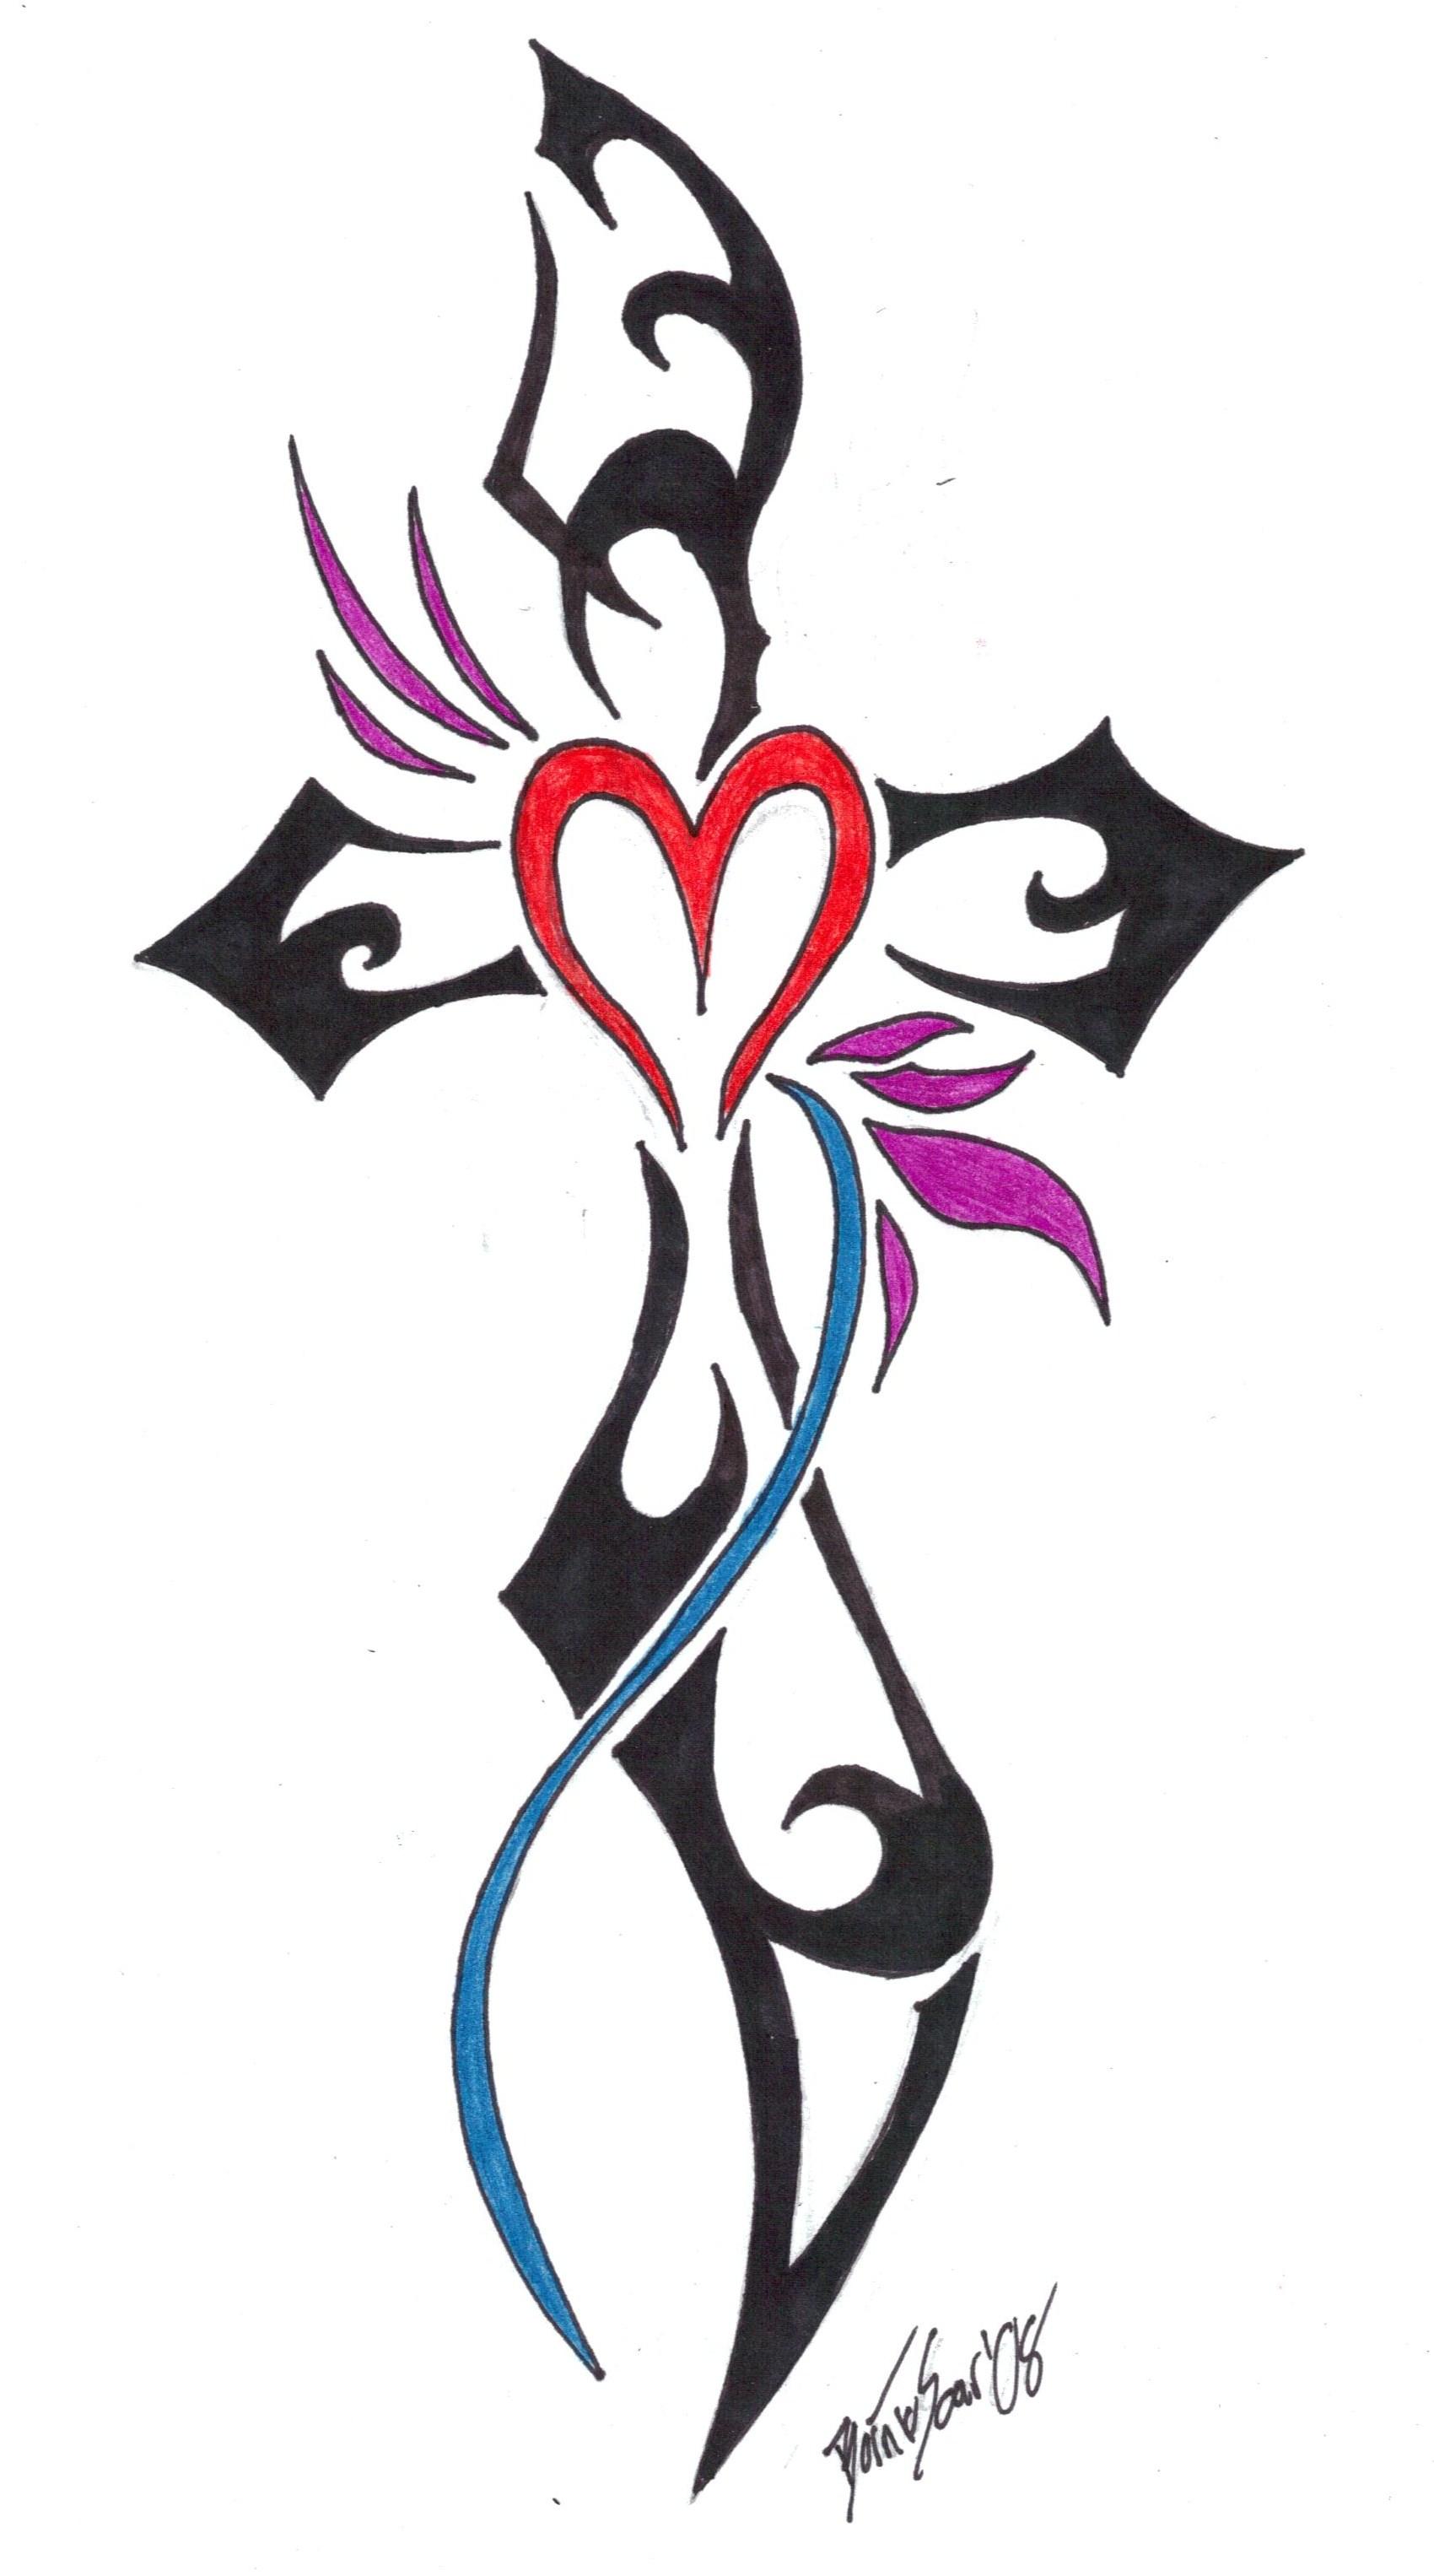 1700x3053 Tiny Heart And Cross Tattoo Design